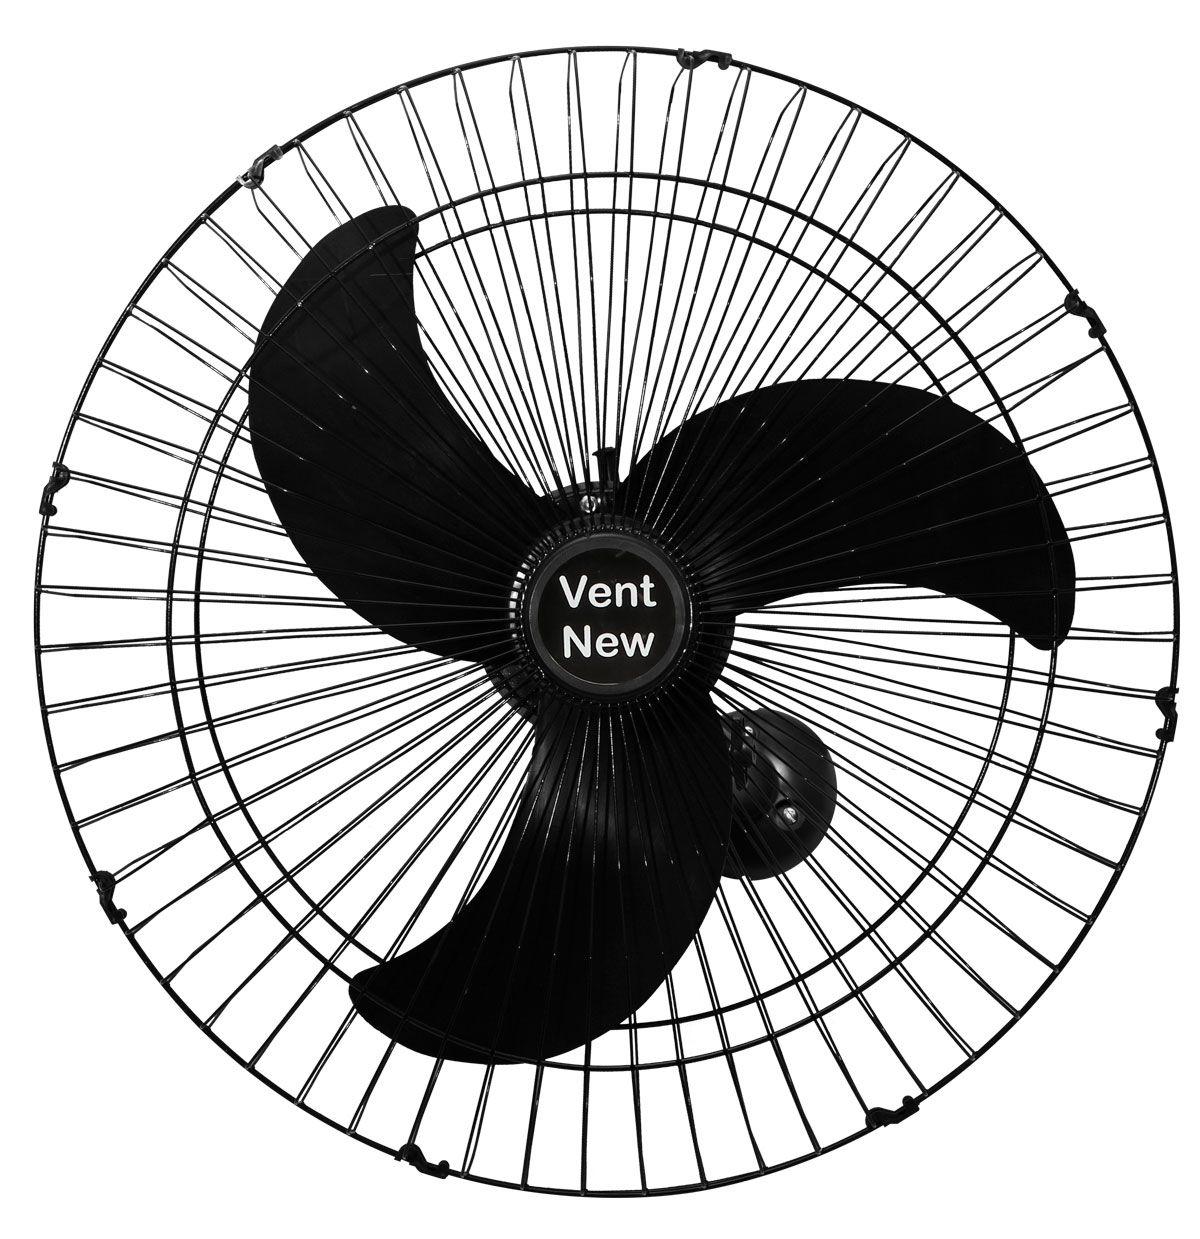 Kit 4 Ventiladores Parede Bivolt Preto Oscilante 60 Cm